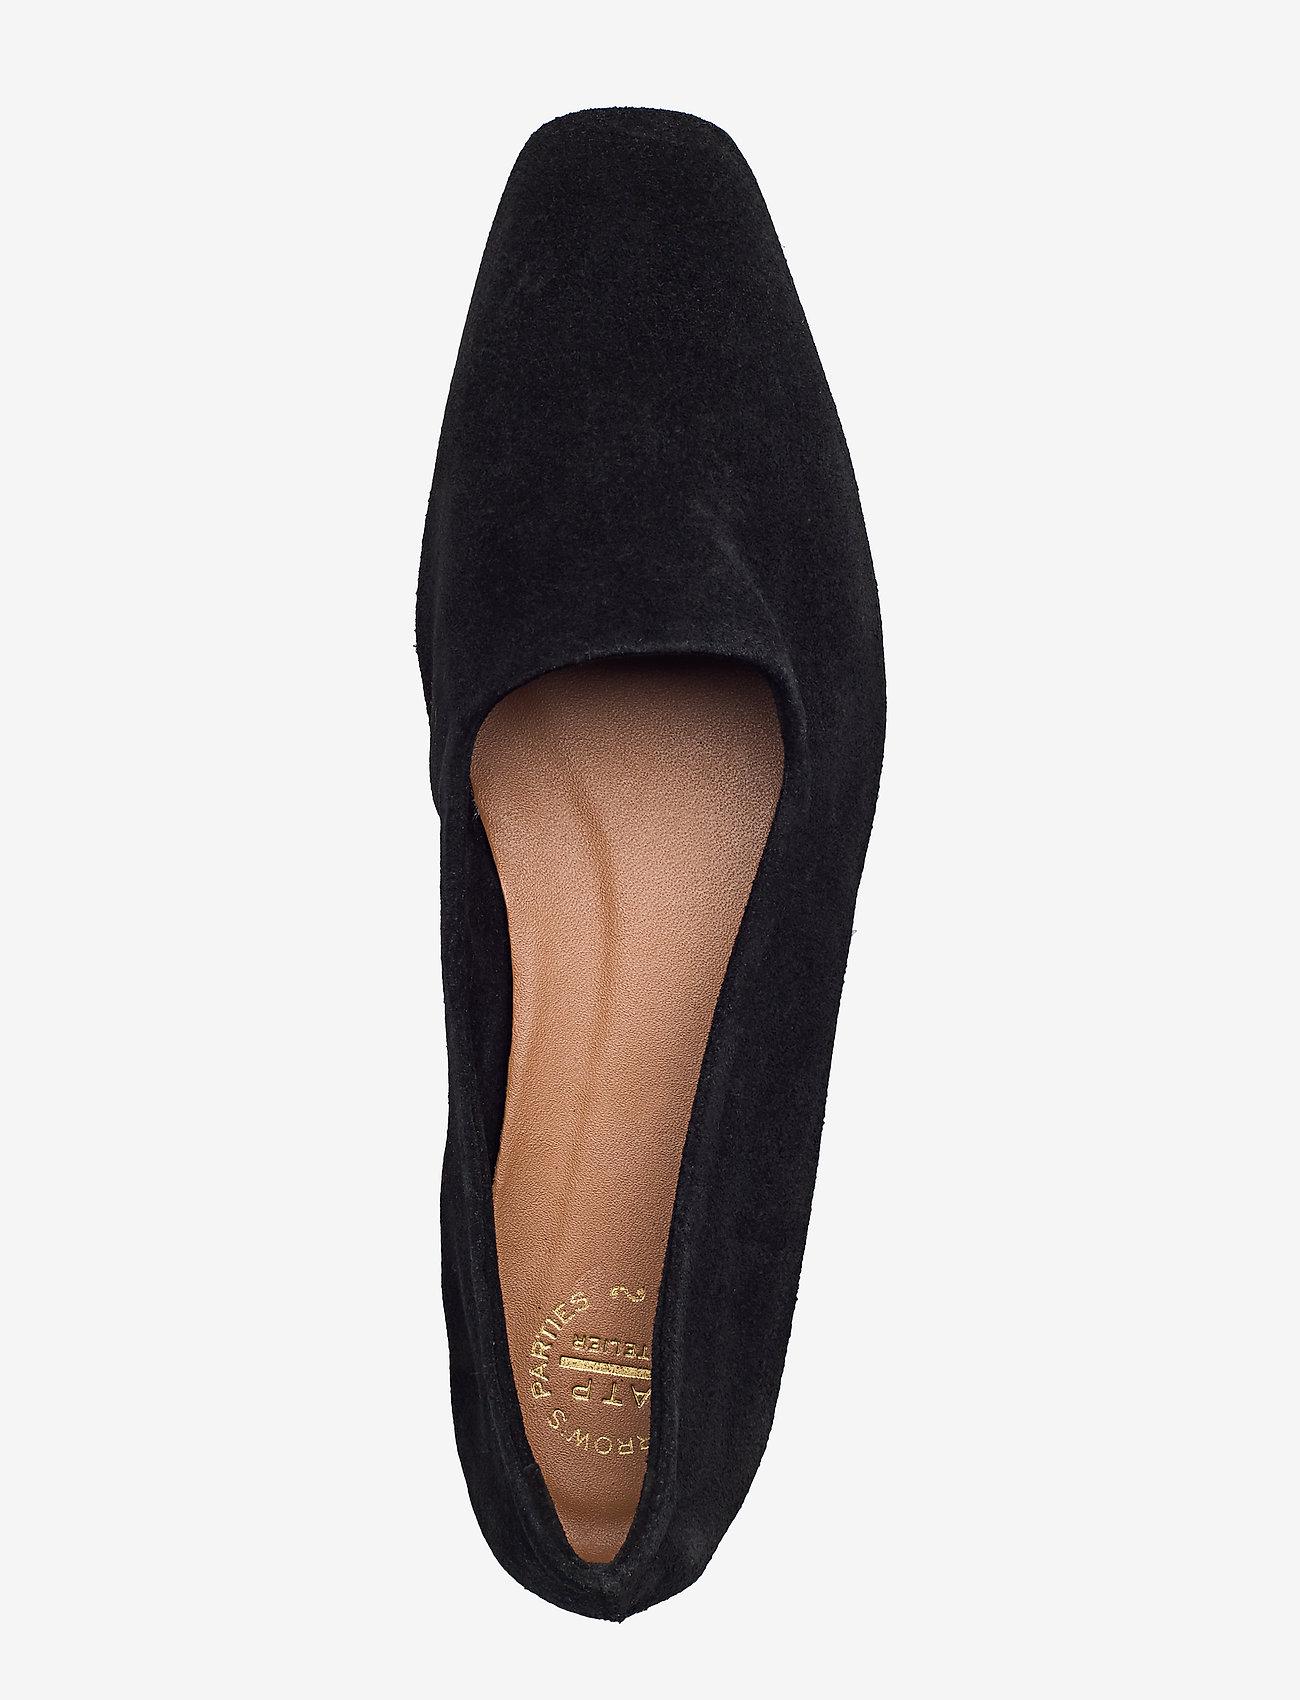 ATP Atelier - Andrano Black Suede - shoes - black - 3